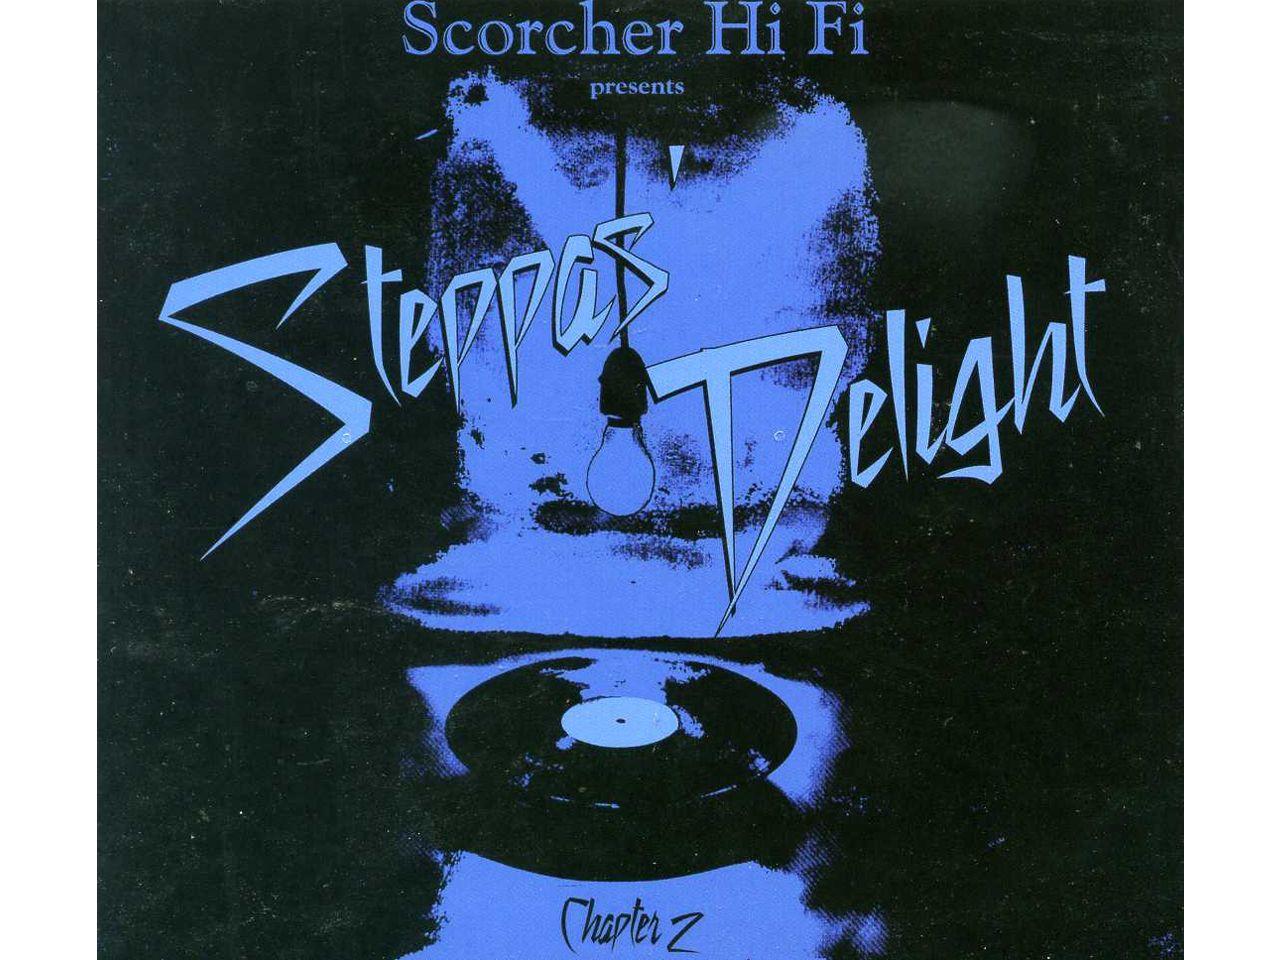 Steppas Delight Chapter 2 -Scorcher Hi Fi-